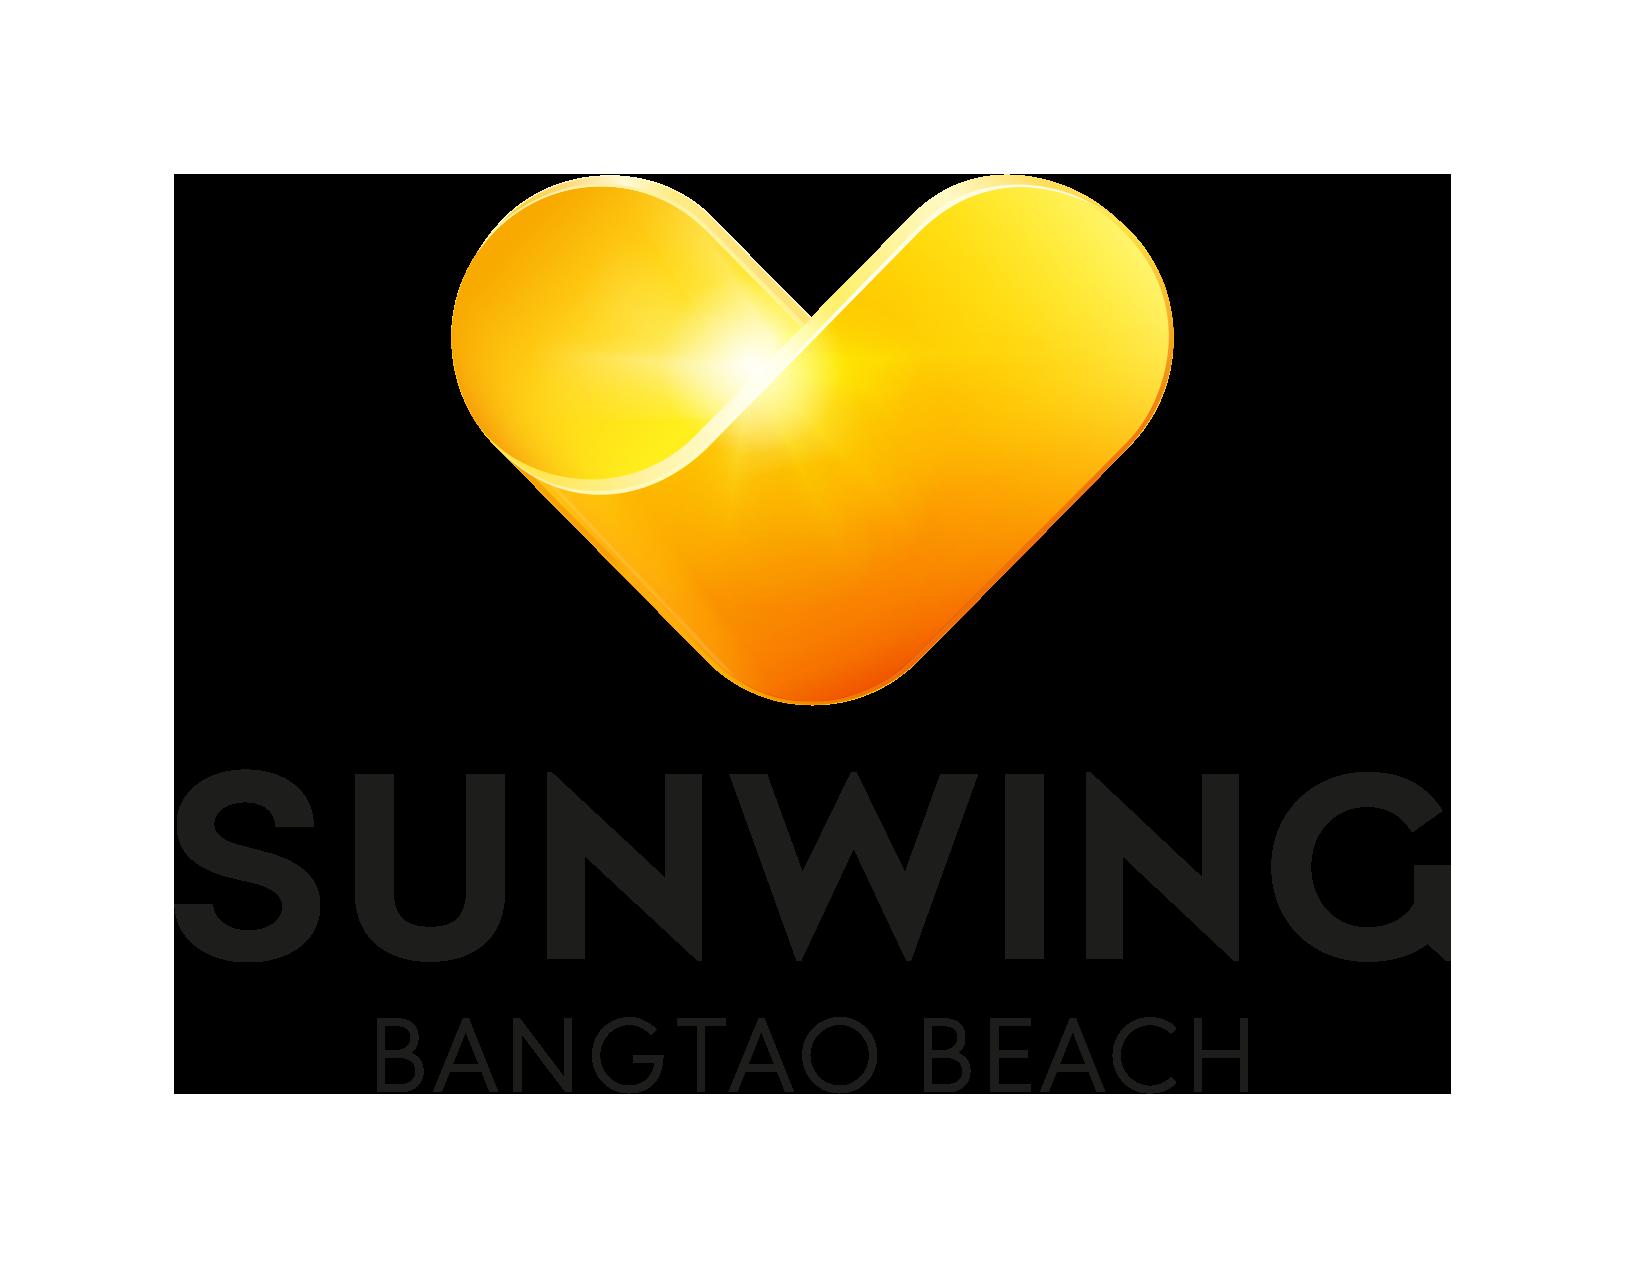 Sunwing Bangtao Beach.